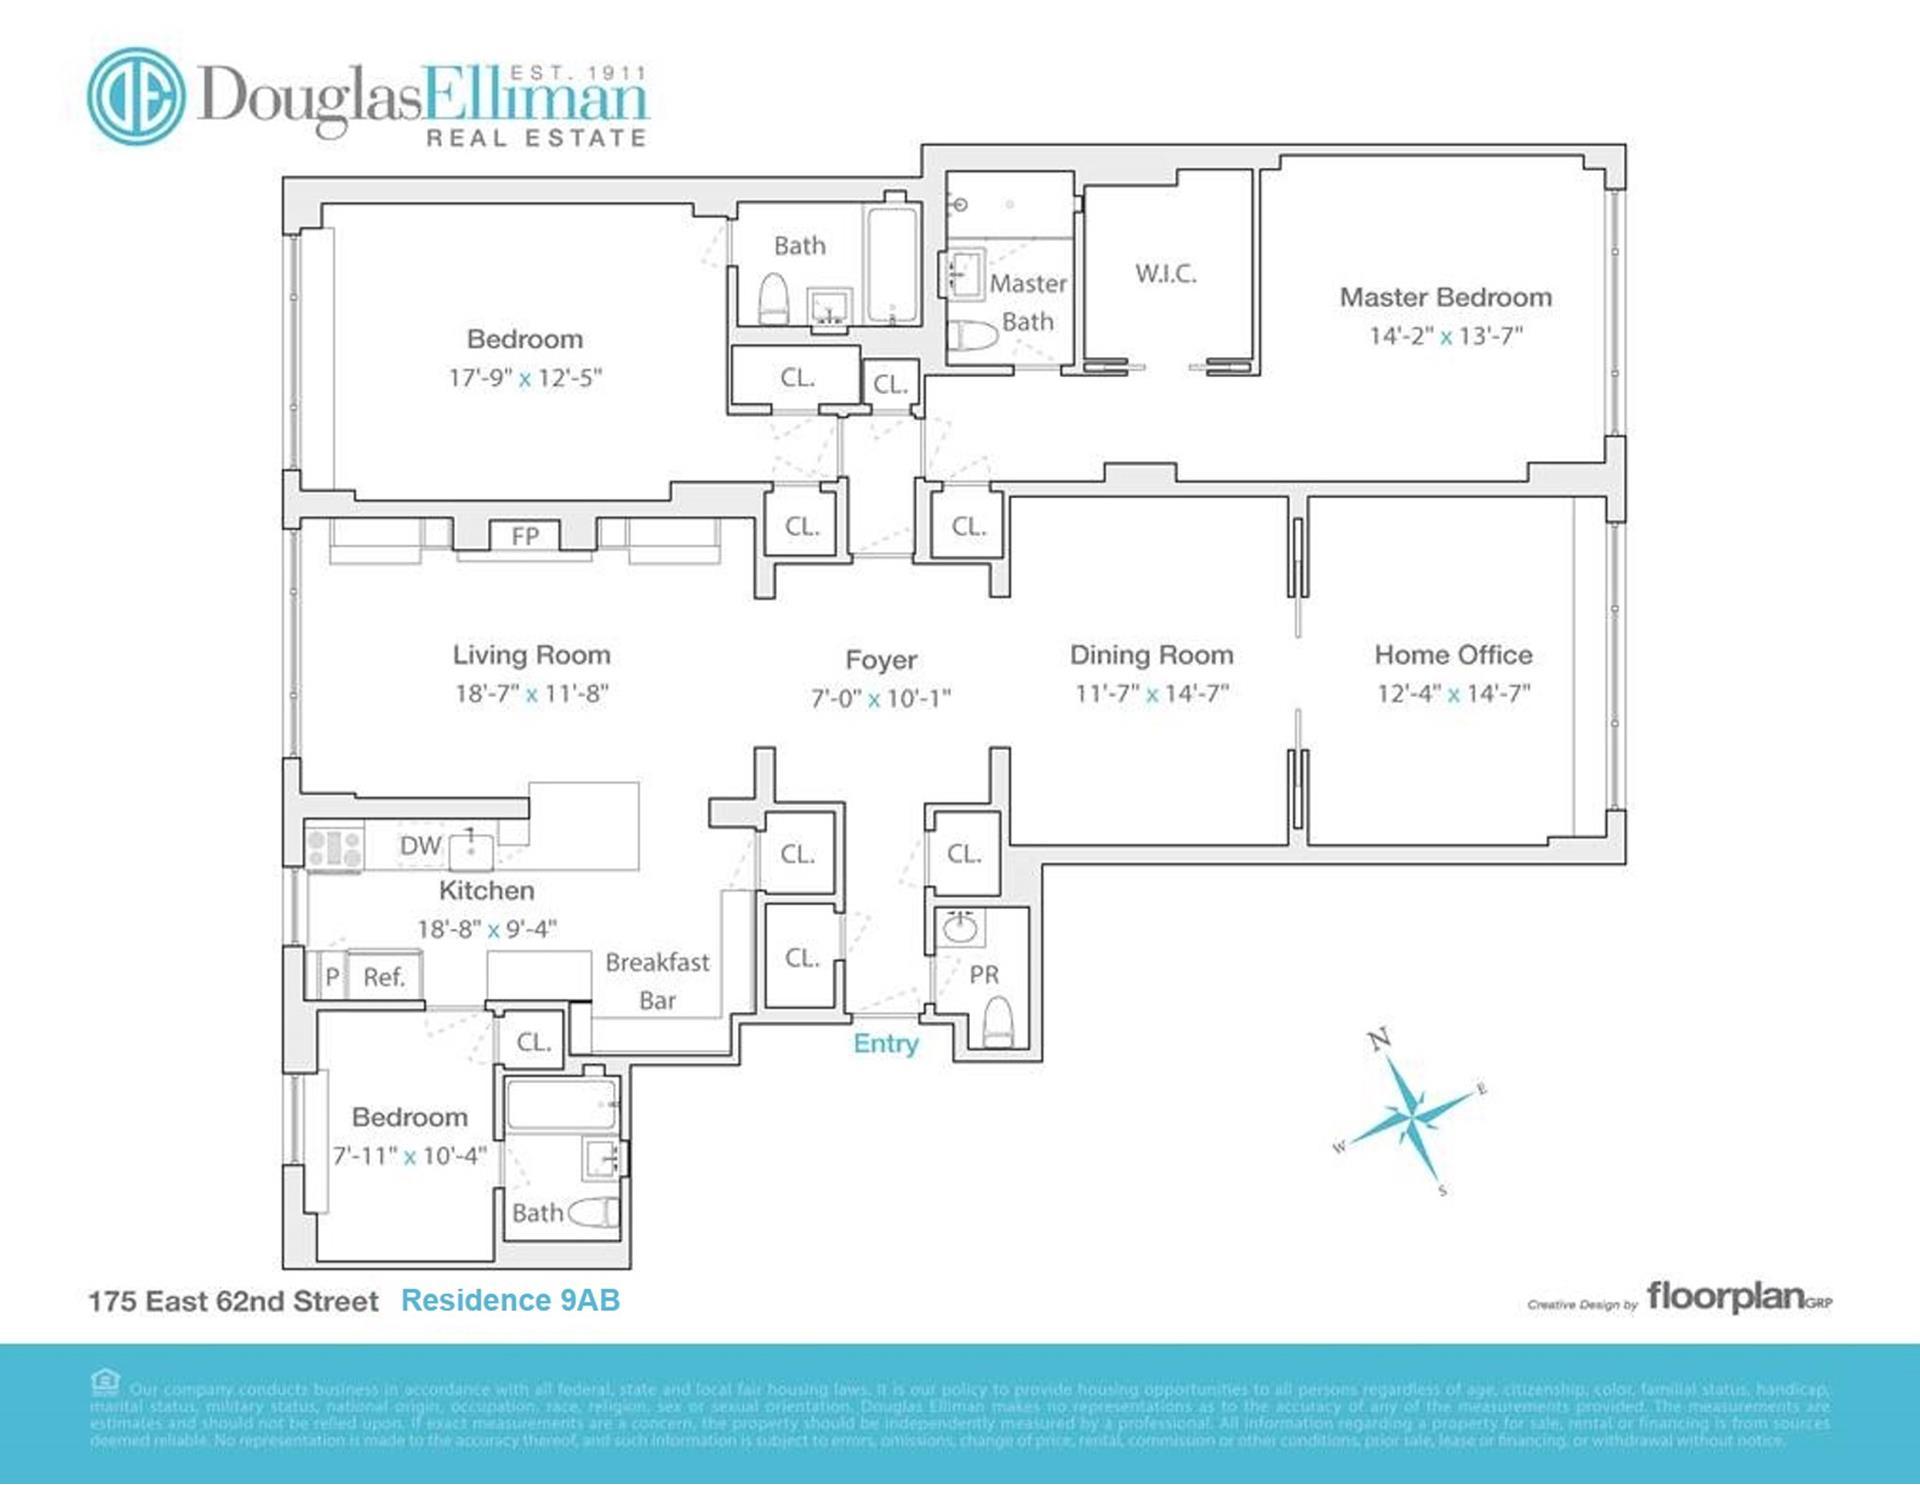 Floor plan of 175 East 62nd St, 9AB - Upper East Side, New York